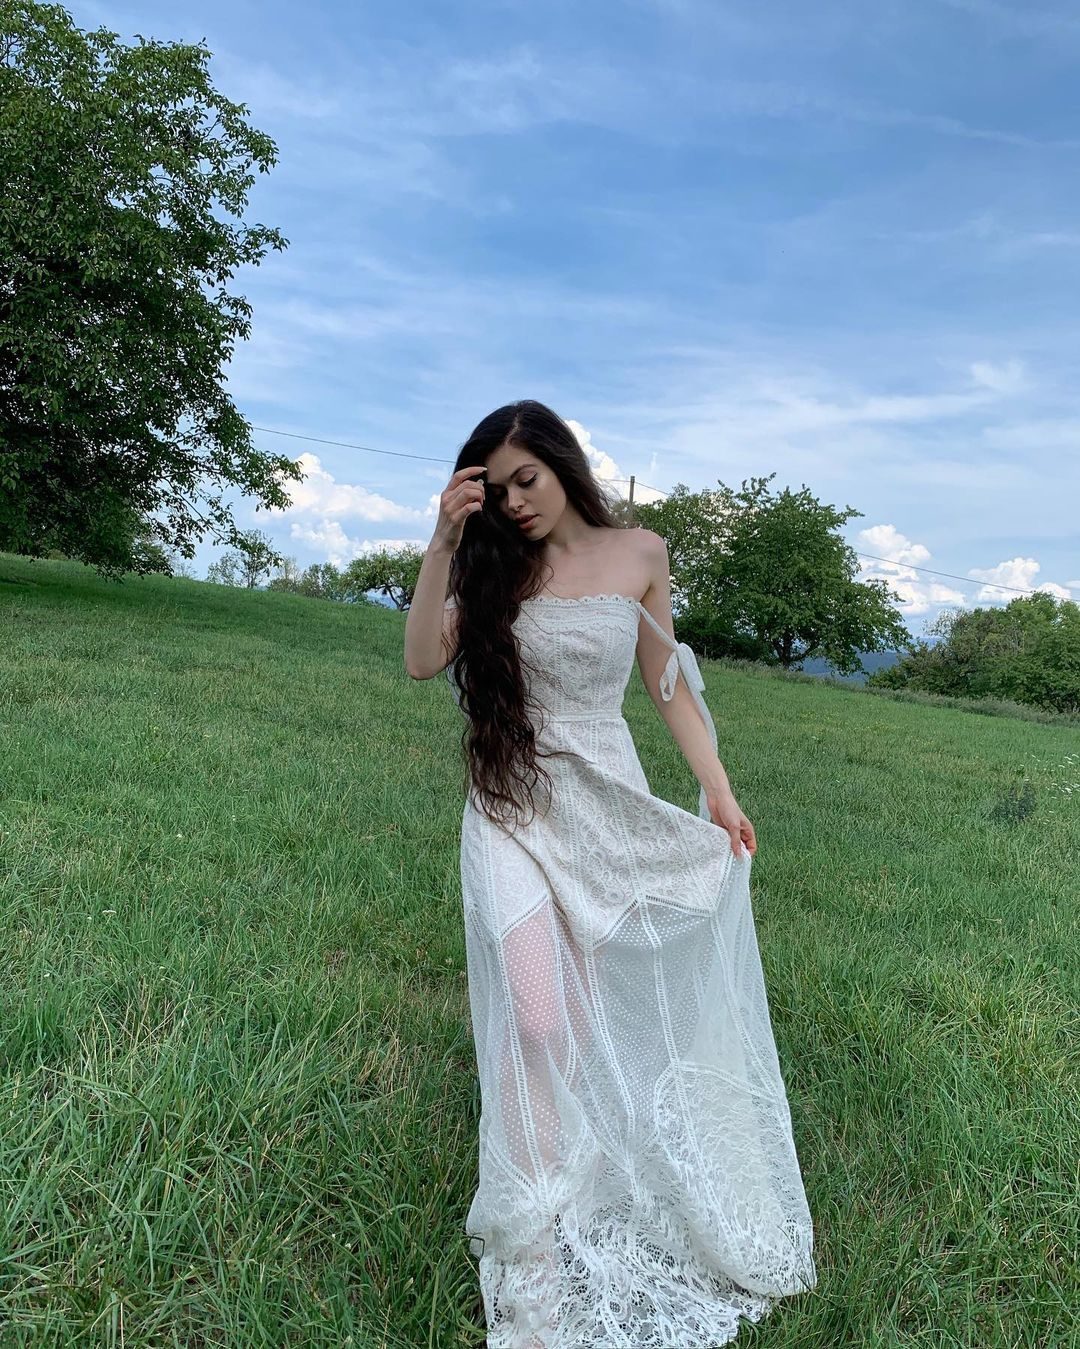 Gulcan Sahinur Twins On Instagram Enjoying Every Little Moment Dress Asyamodeasyagold Anzeige In 2021 Black Sequin Prom Dress Dresses Best Summer Dresses [ 1349 x 1080 Pixel ]